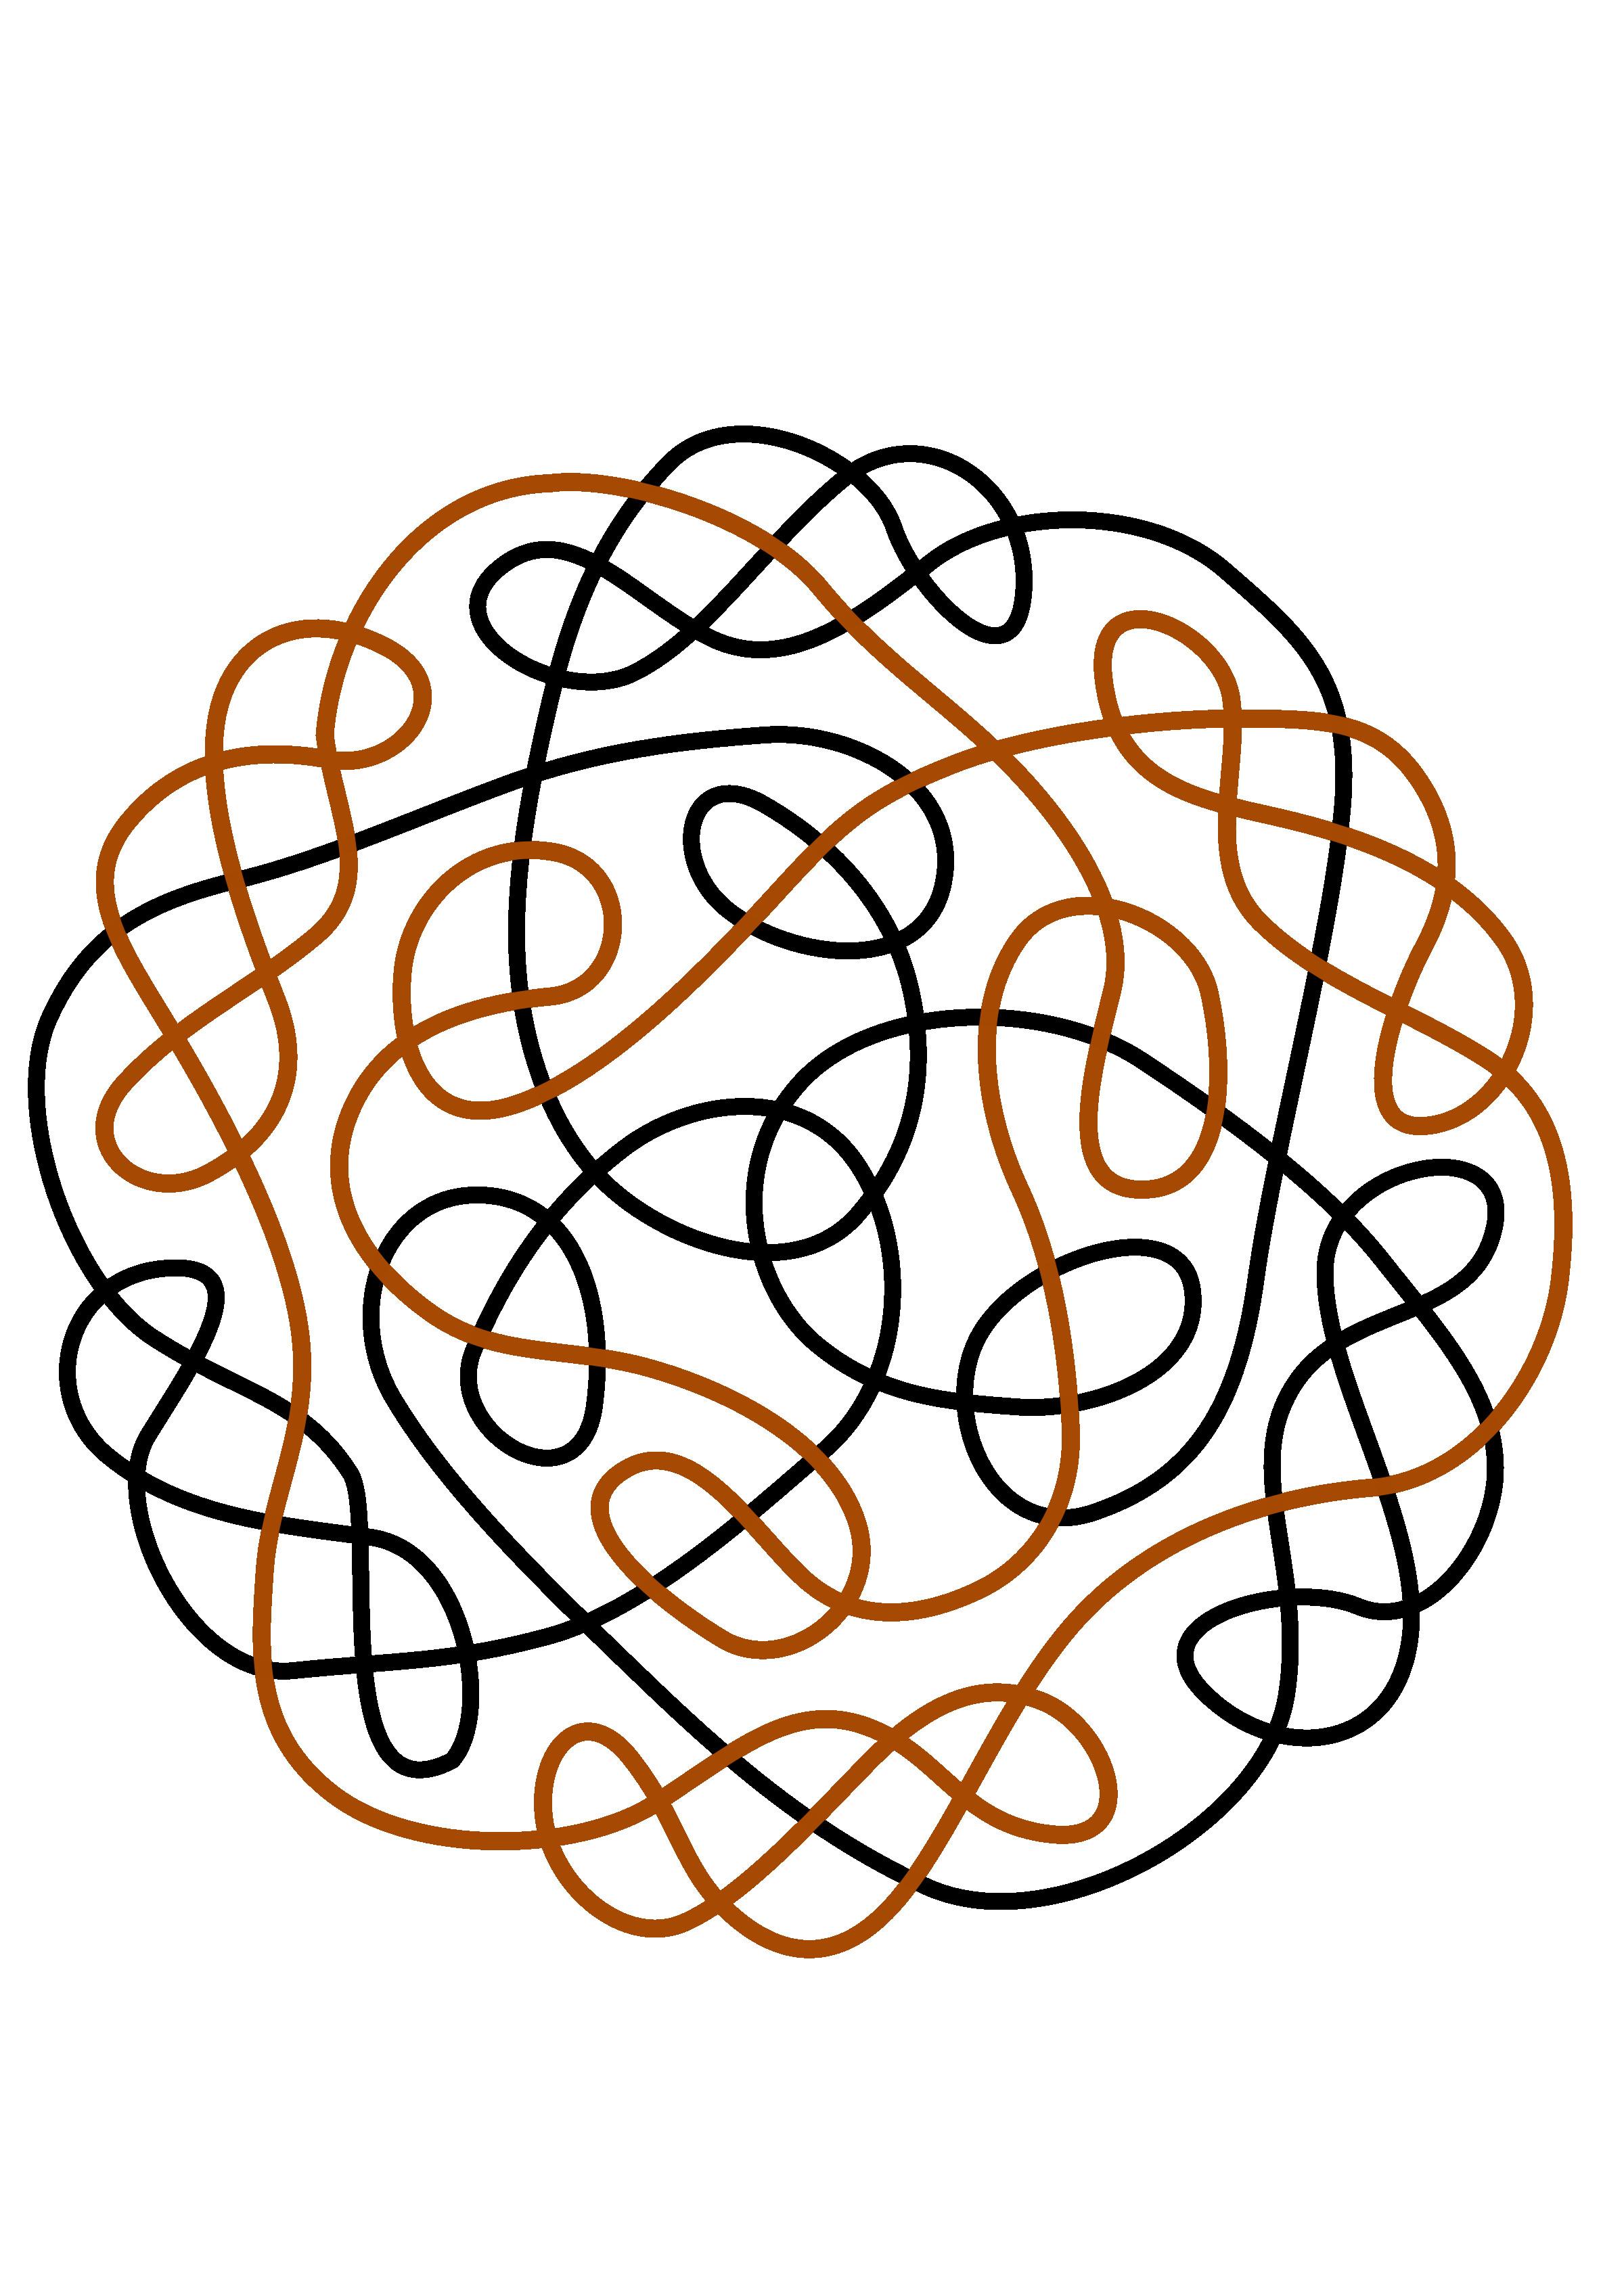 2400x3394 Celtic Knot Celts Clip Art Png Download 5000 5717 Free